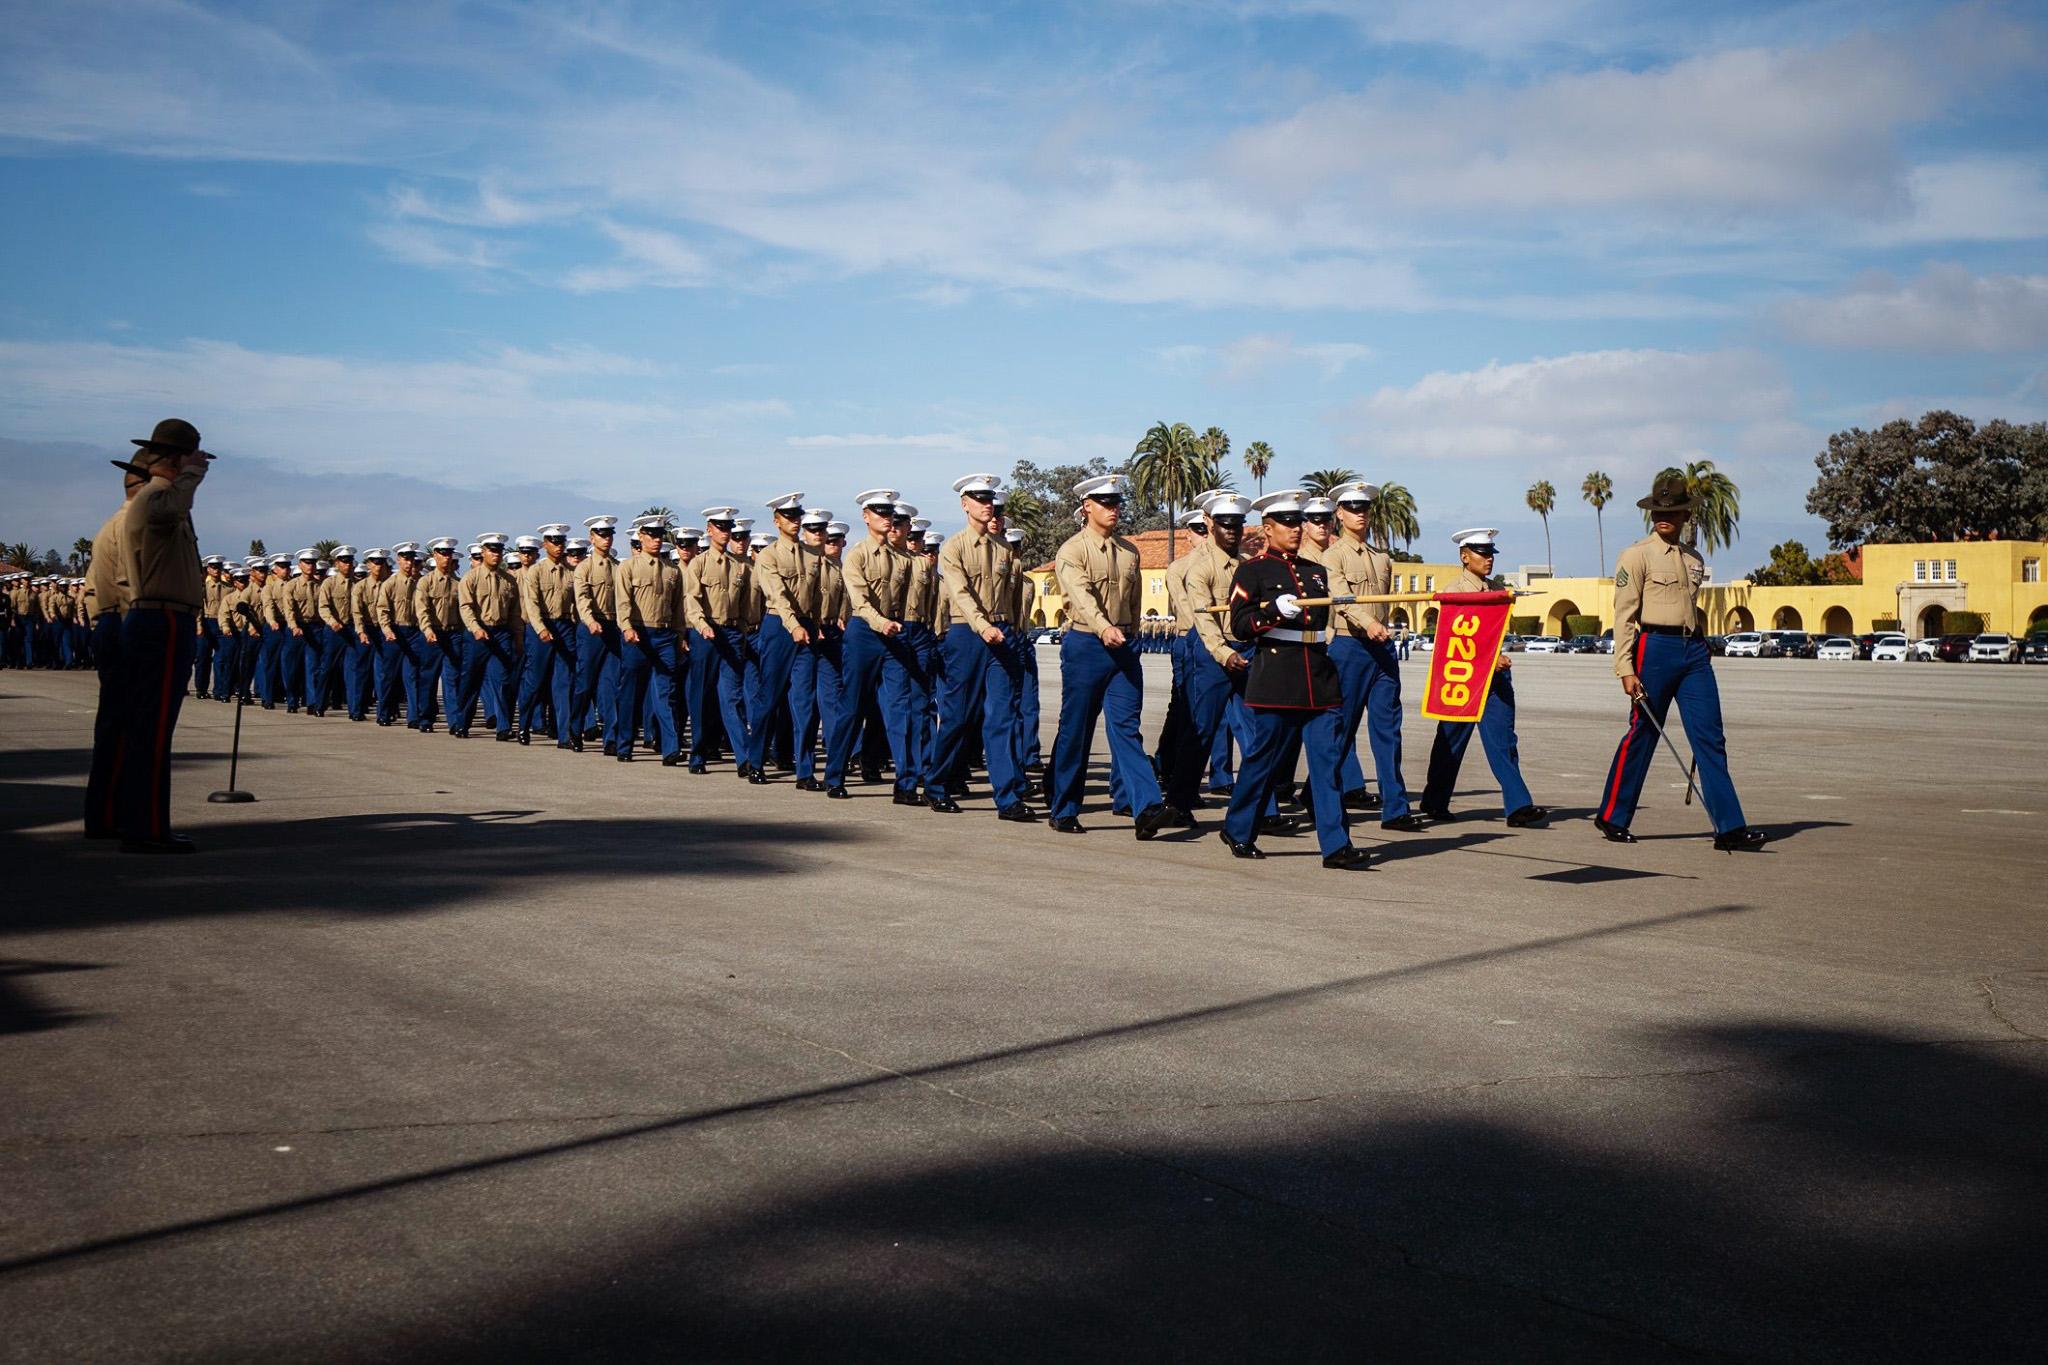 Marine Corps Recruit Depot San Diego Graduation Graduation Program